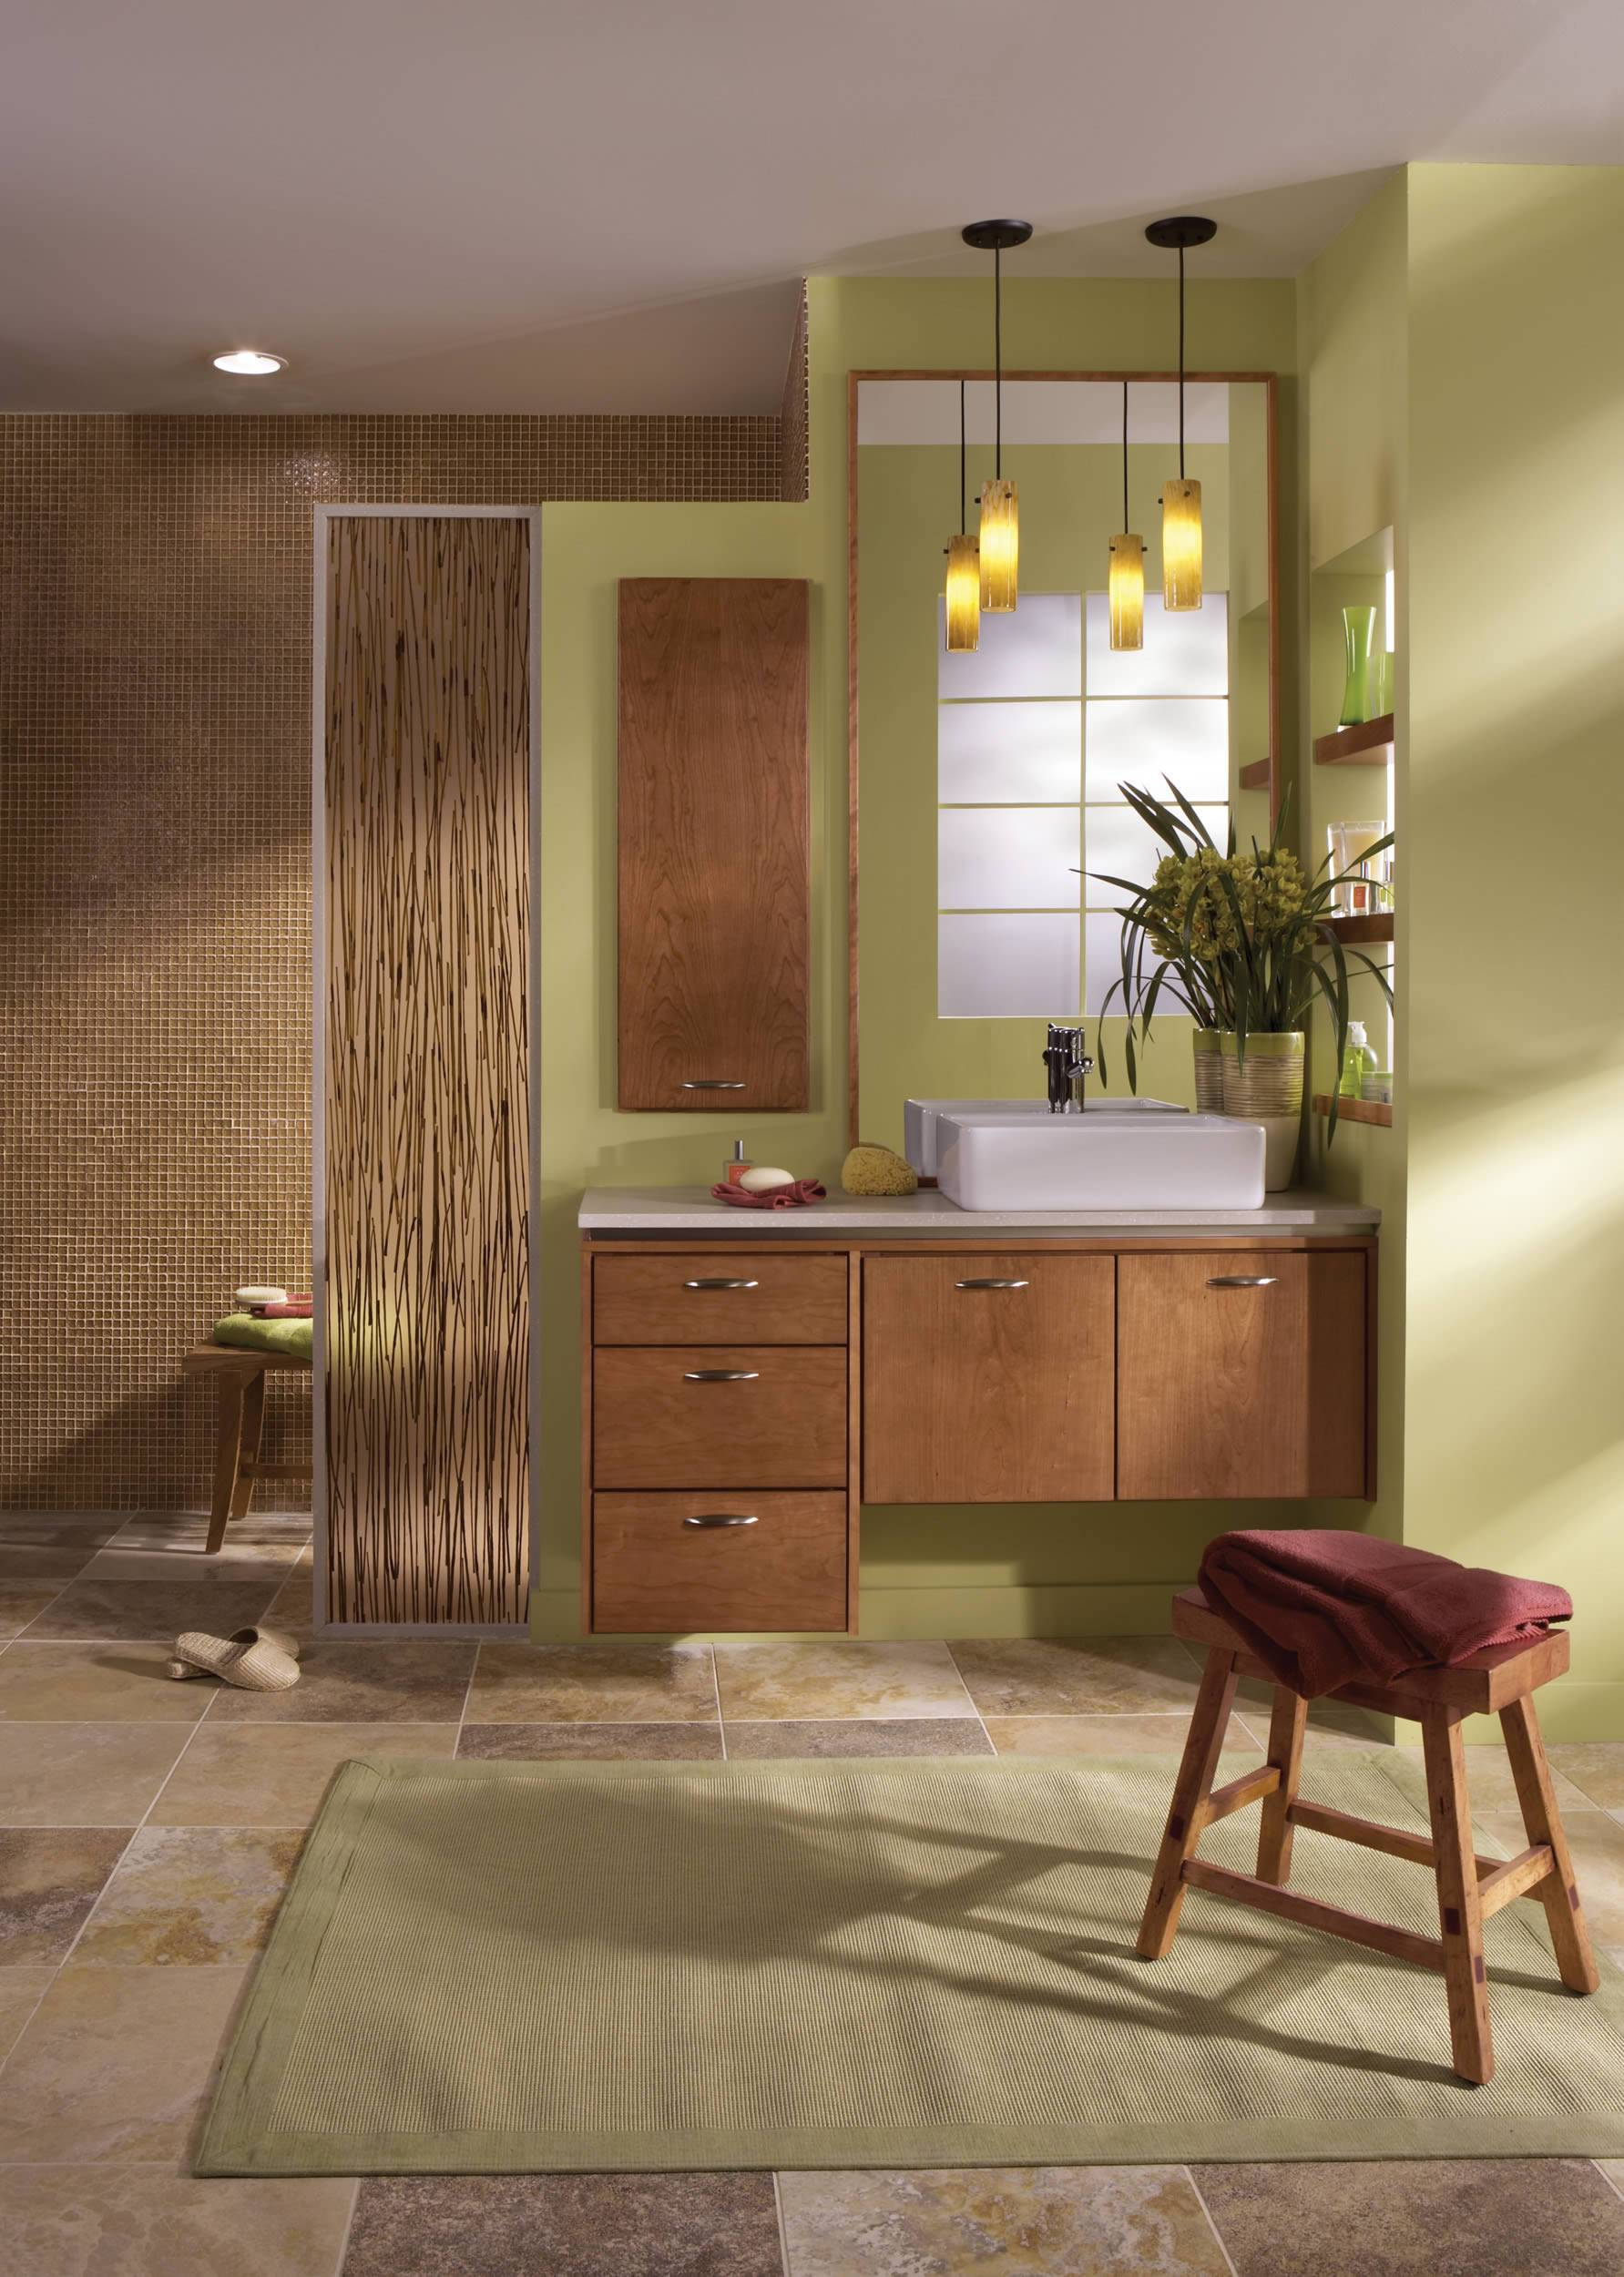 Merillat Kitchen Cabinets Merillatr Takes Dream Design To The Bath Merillat